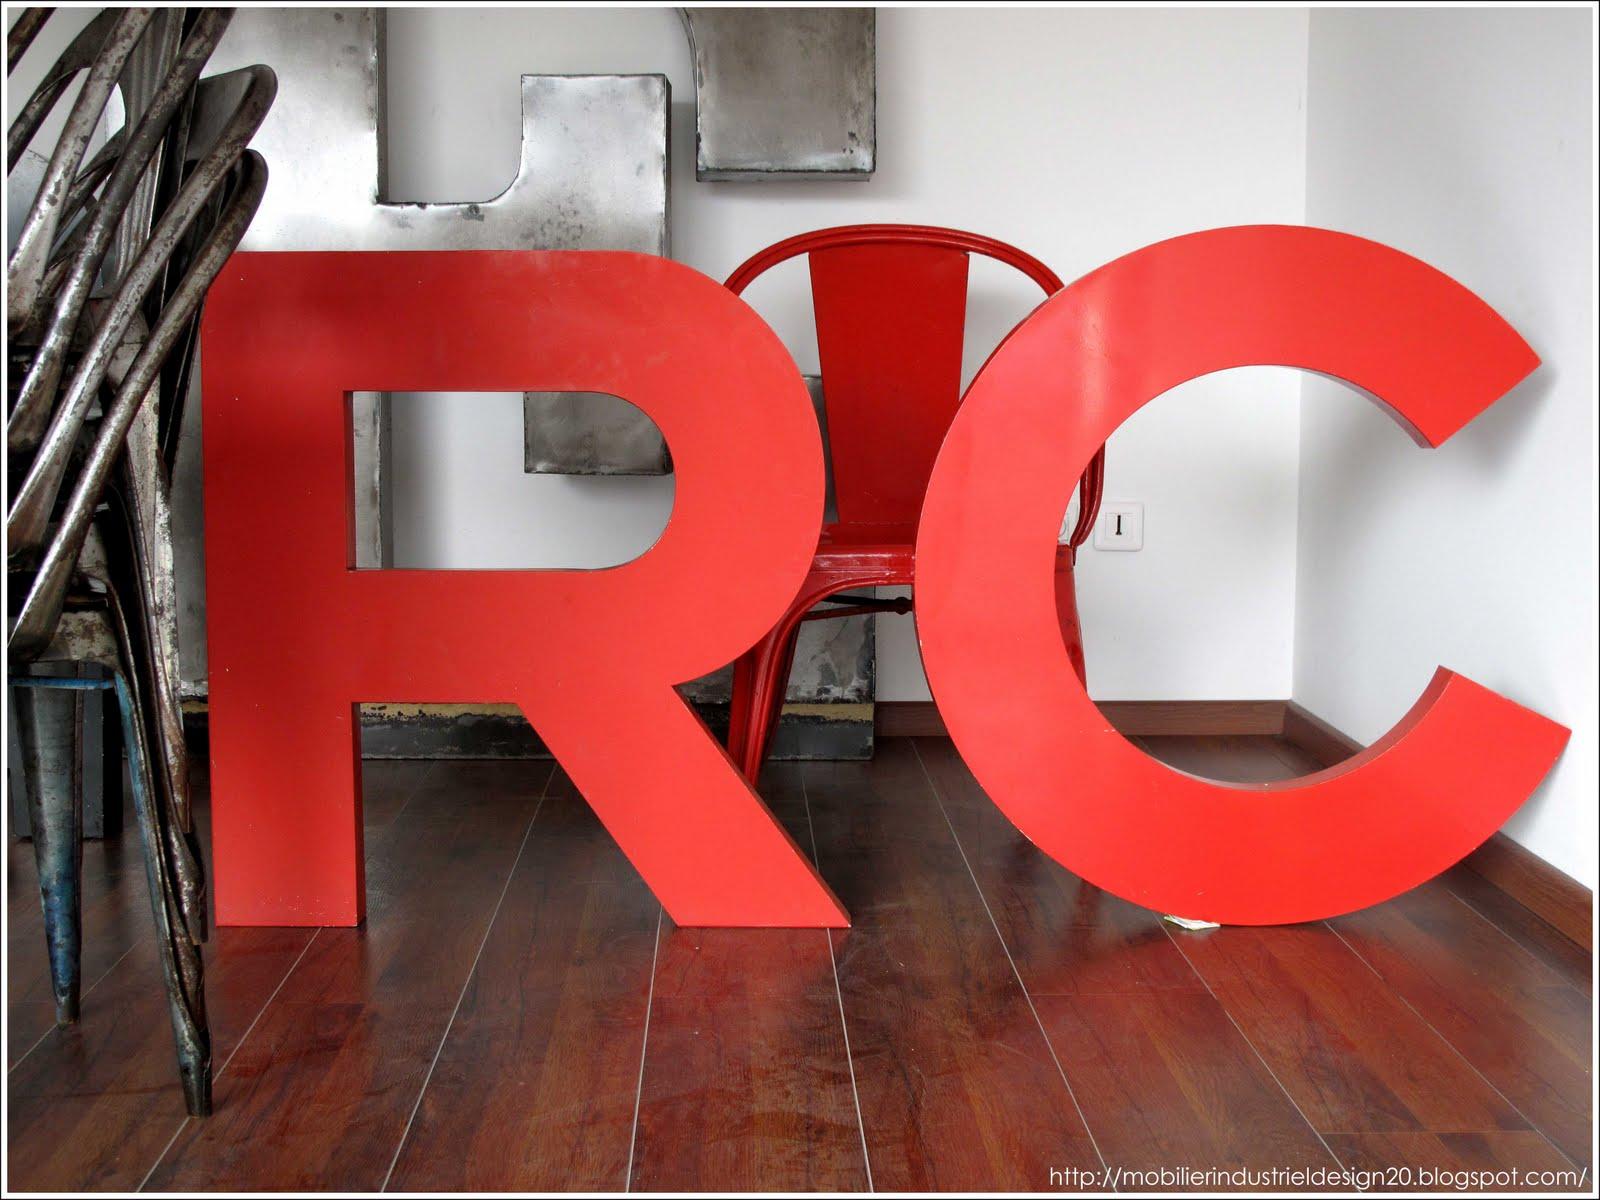 lettres d 39 enseigne vintage mobilierdesign20lettresenseigne grandes lettres rouges. Black Bedroom Furniture Sets. Home Design Ideas